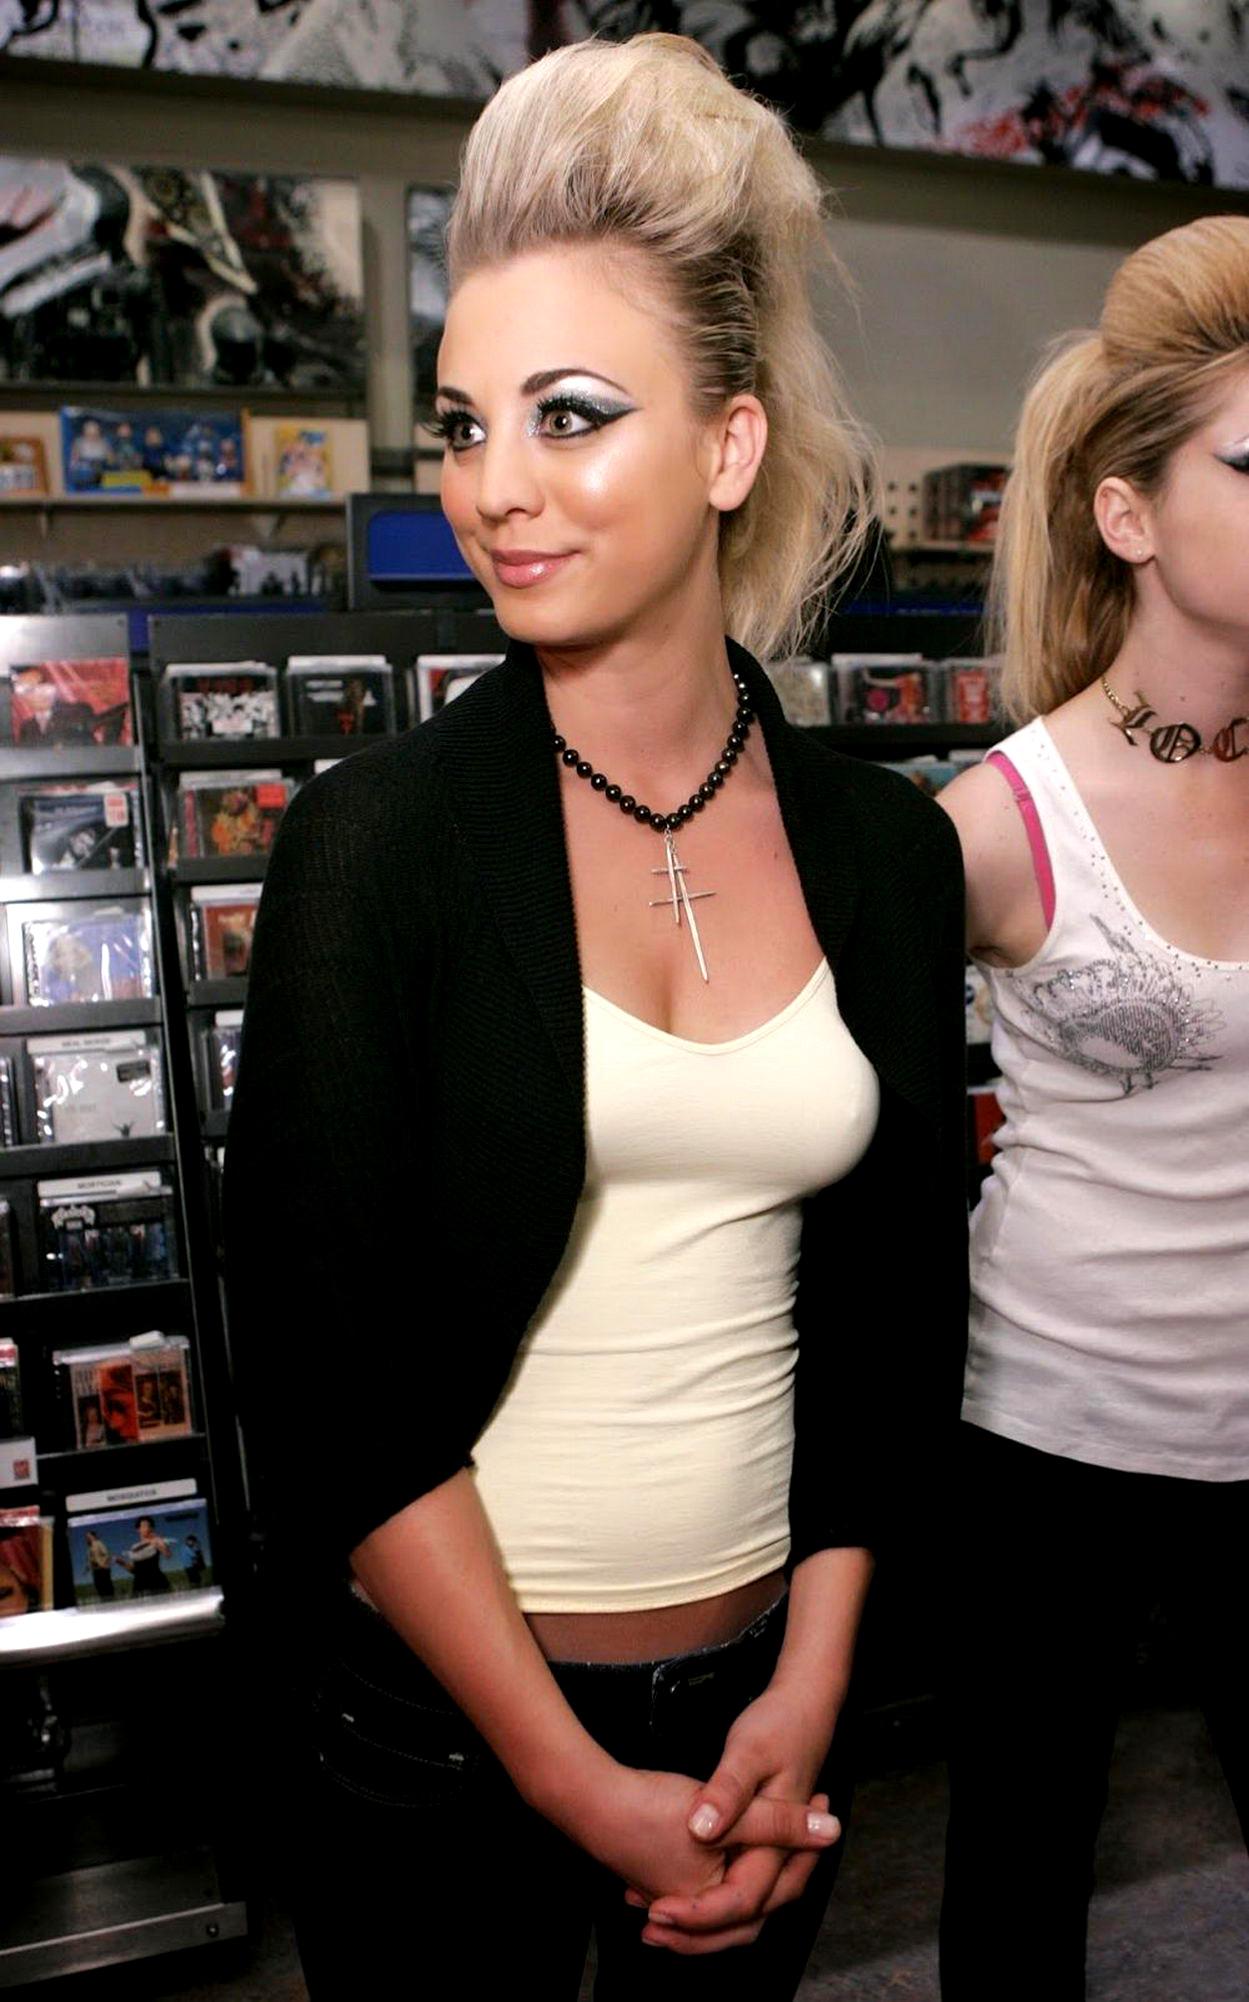 Kaley Cuoco 2015 : Kaley Cuoco: The Virgin Megastore RocknRoll Fashion Show (2006)-01